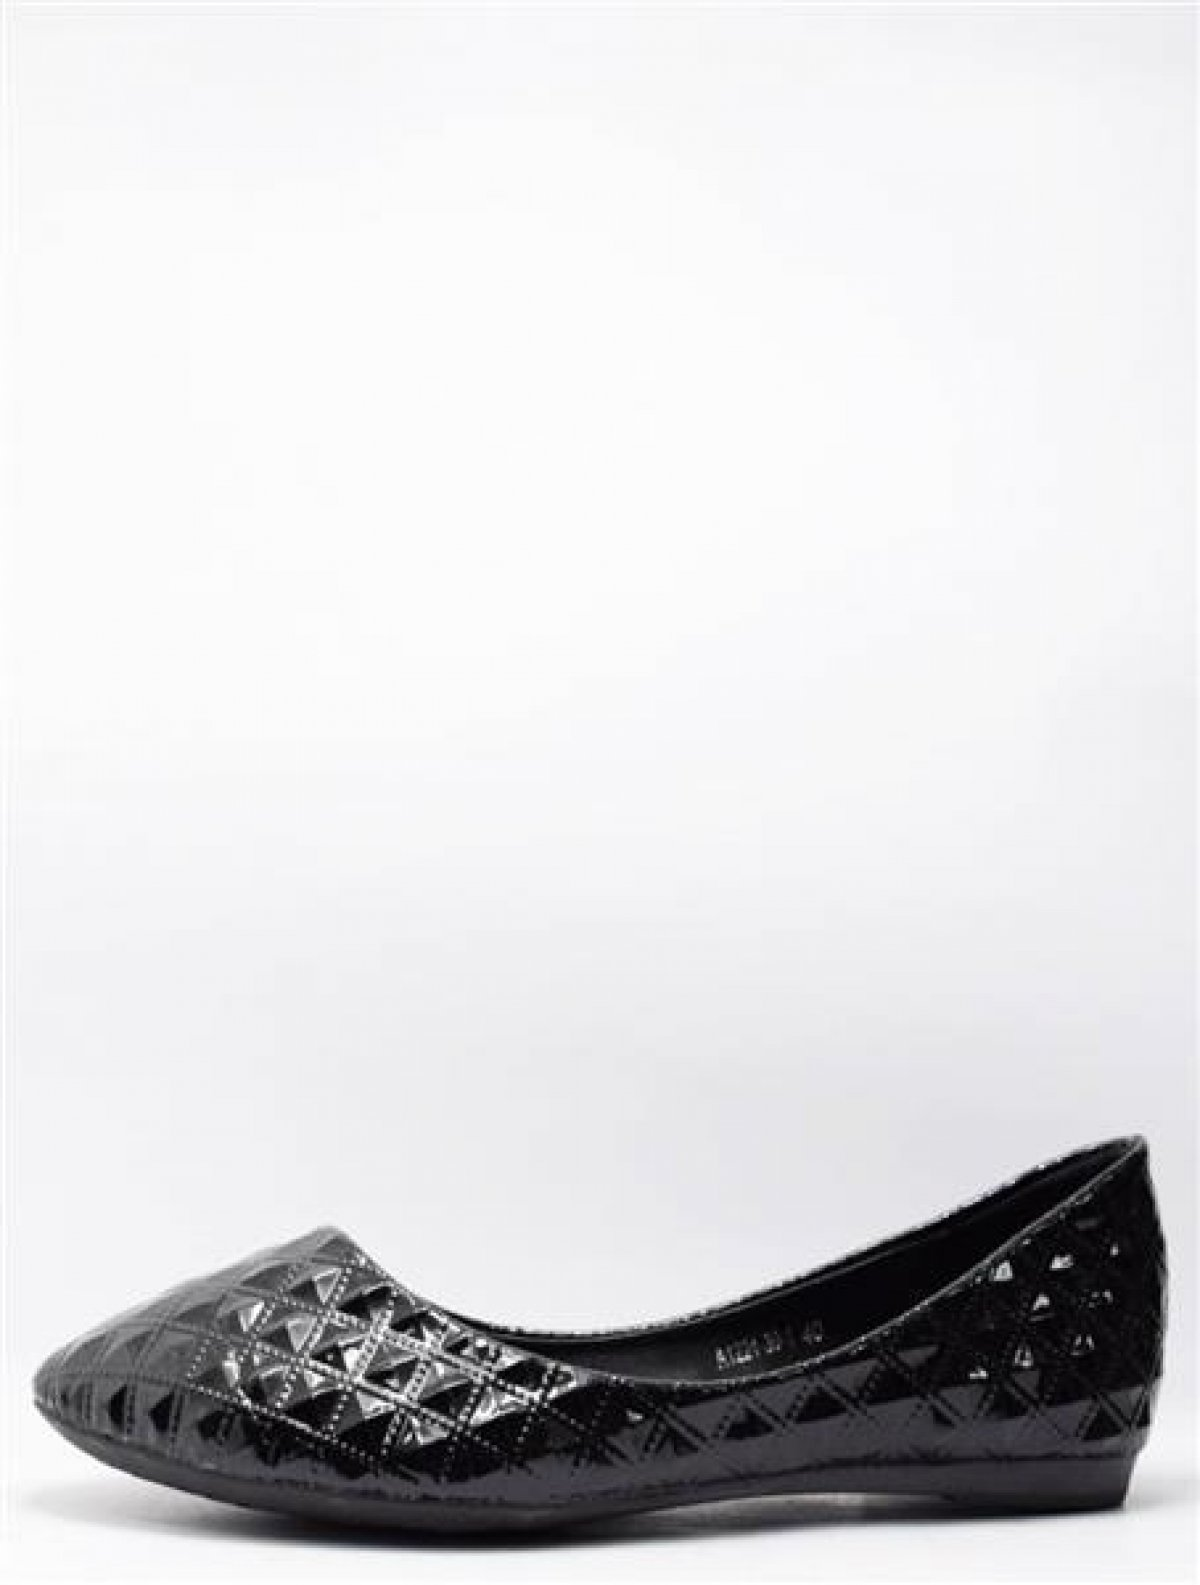 Bona Mente A1224-30-1 балетки женские